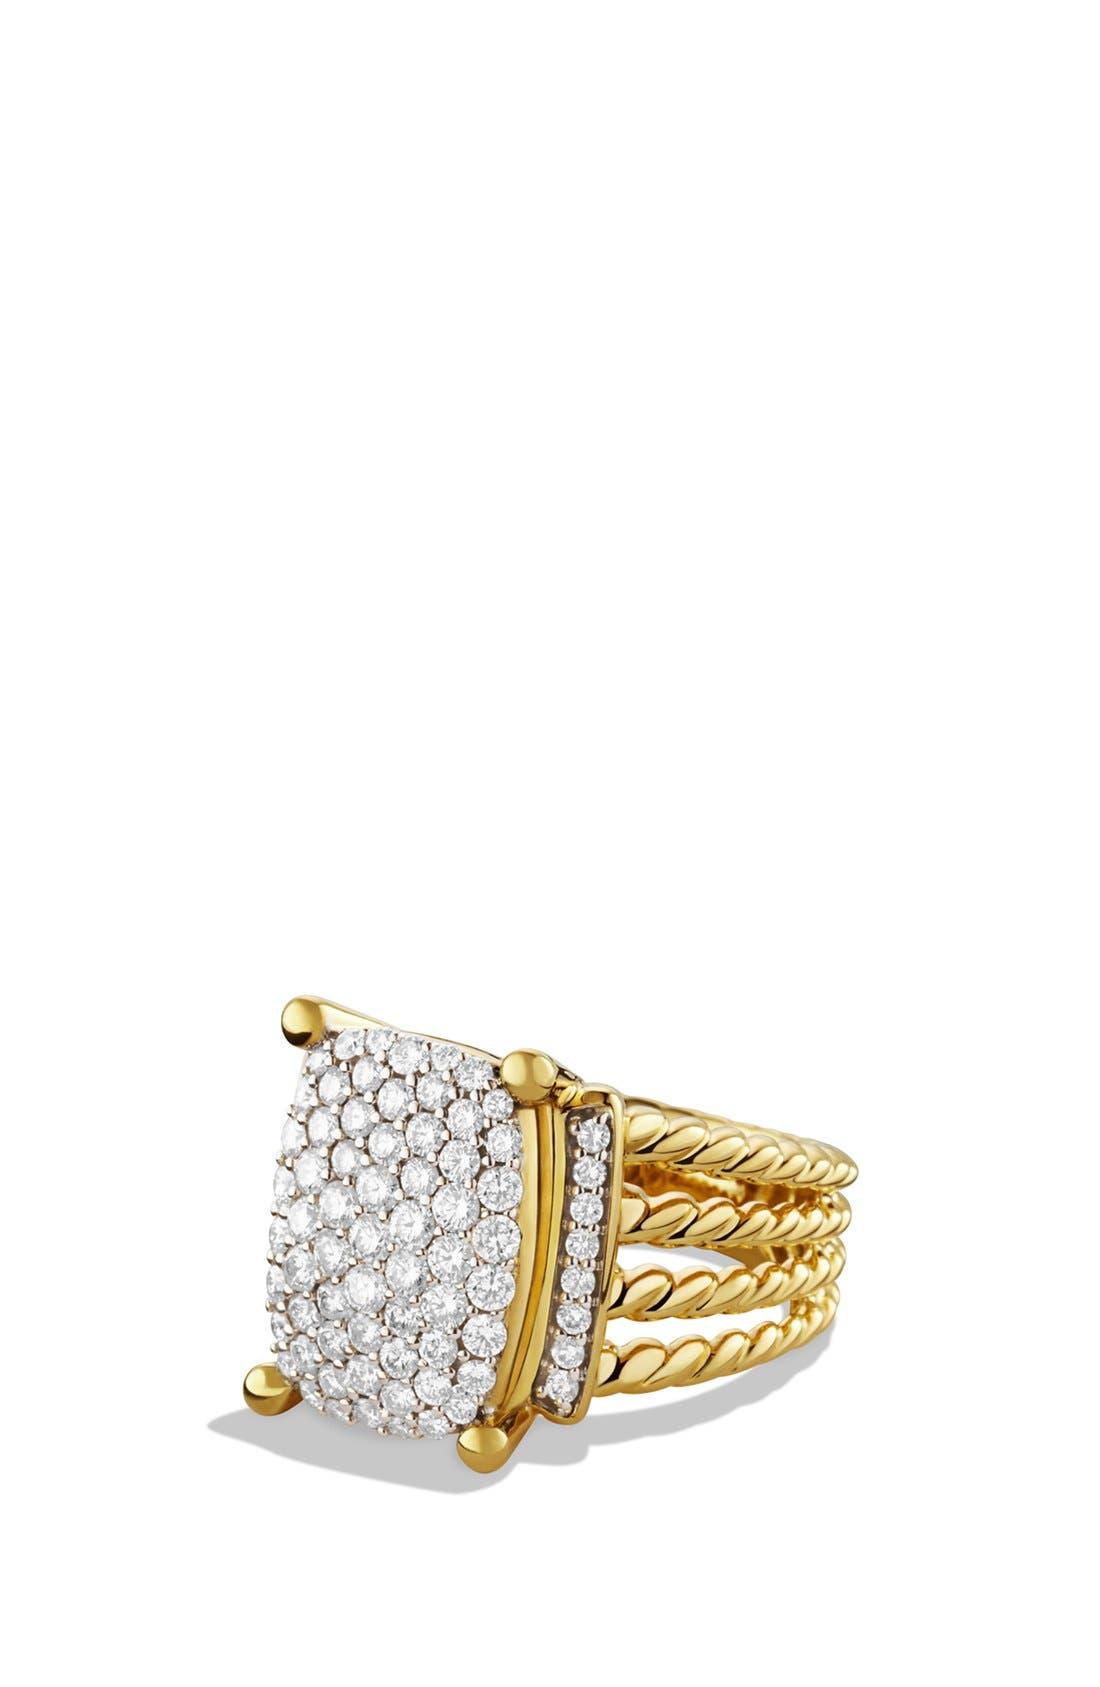 'Wheaton' Ring with Diamonds in Gold,                         Main,                         color, Diamond